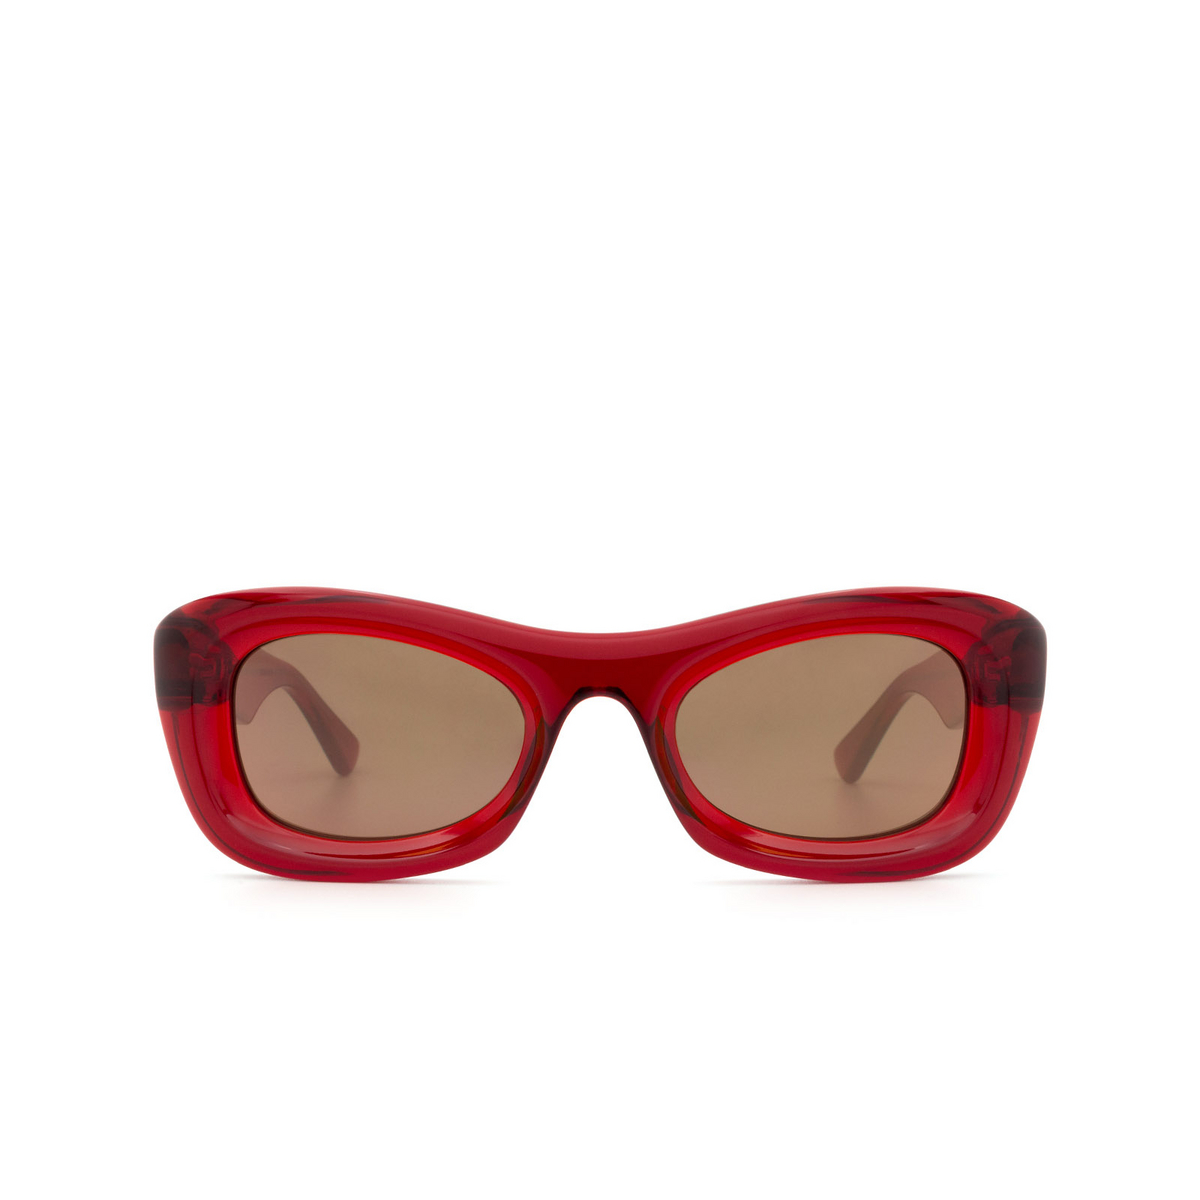 Bottega Veneta® Rectangle Sunglasses: BV1088S color Burgundy 007 - front view.